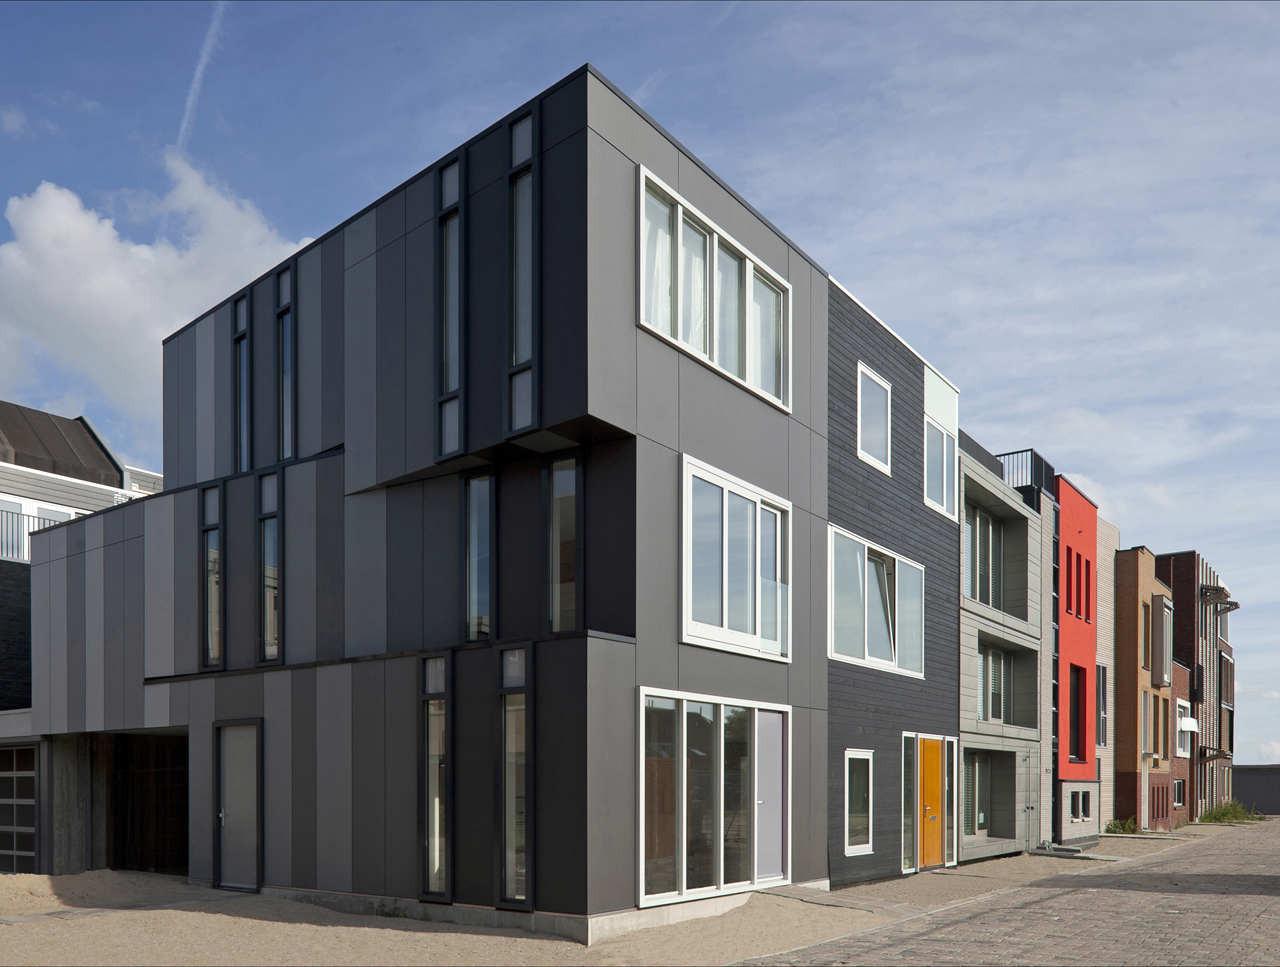 Corner House in Leiden / Marc Koehler Architects + Sophie Valla Architects, © Luuk Kramer